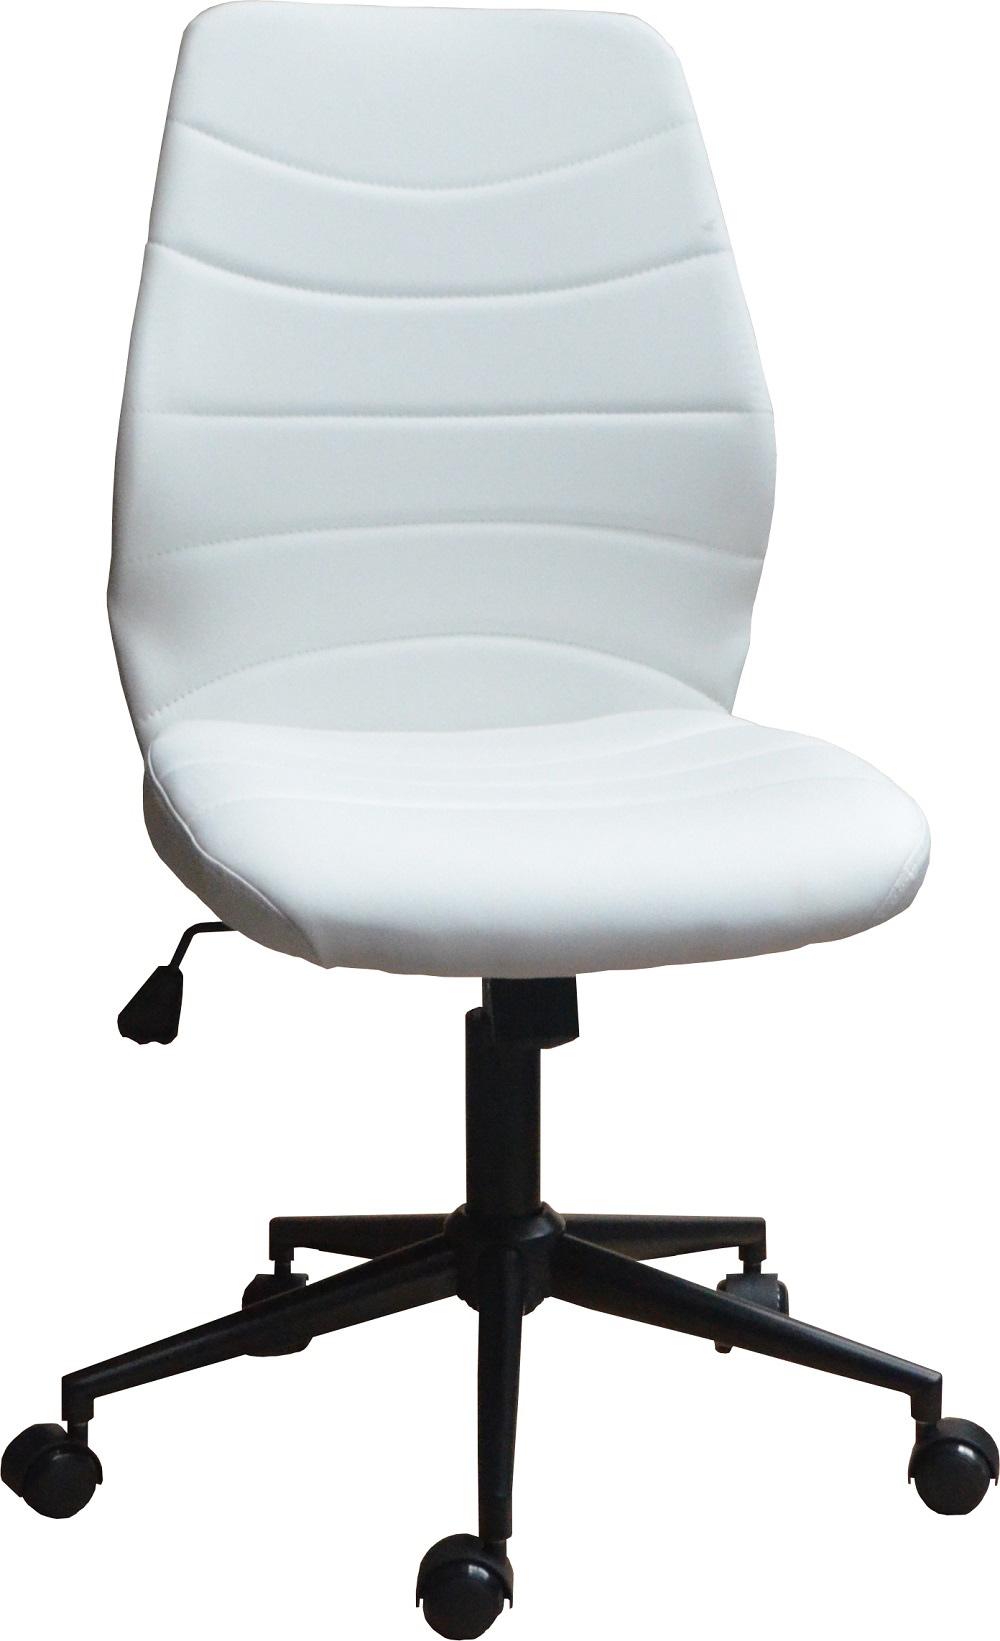 Chaise de bureau design en PU blanc Gina